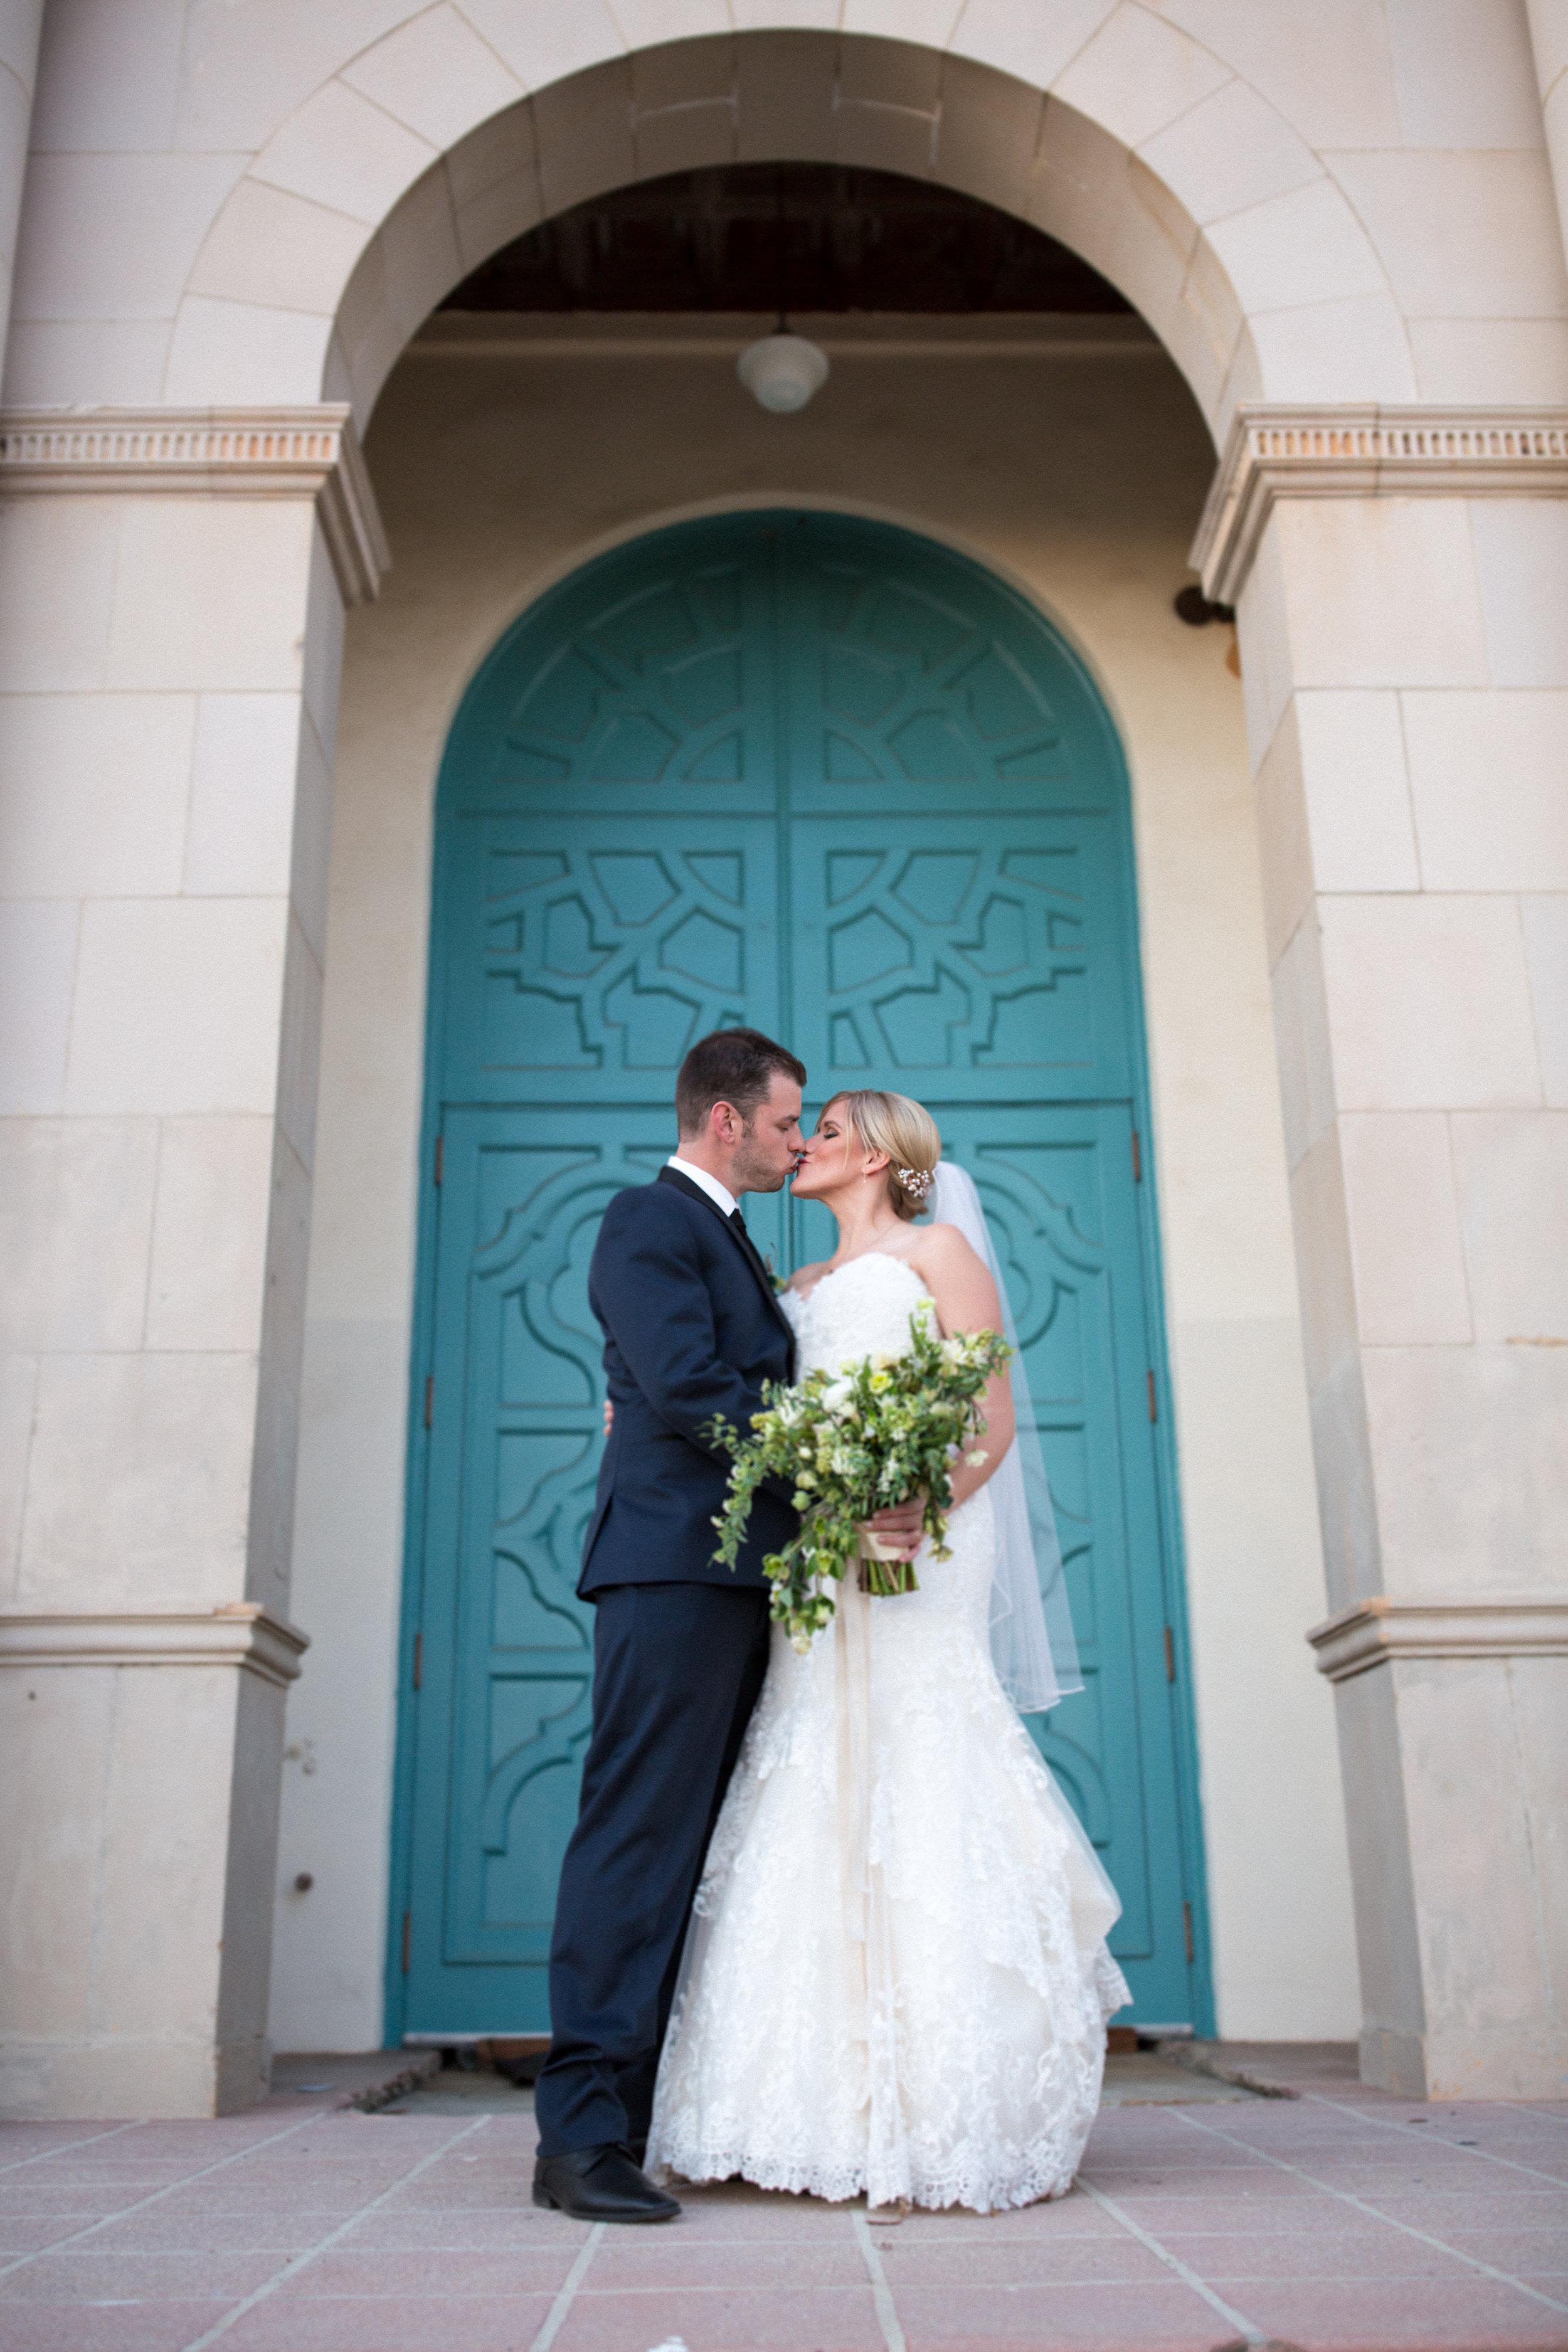 www.santabarbarawedding.com | Elizabeth Victoria Photo | Garden Street Academy | Bride and Groom